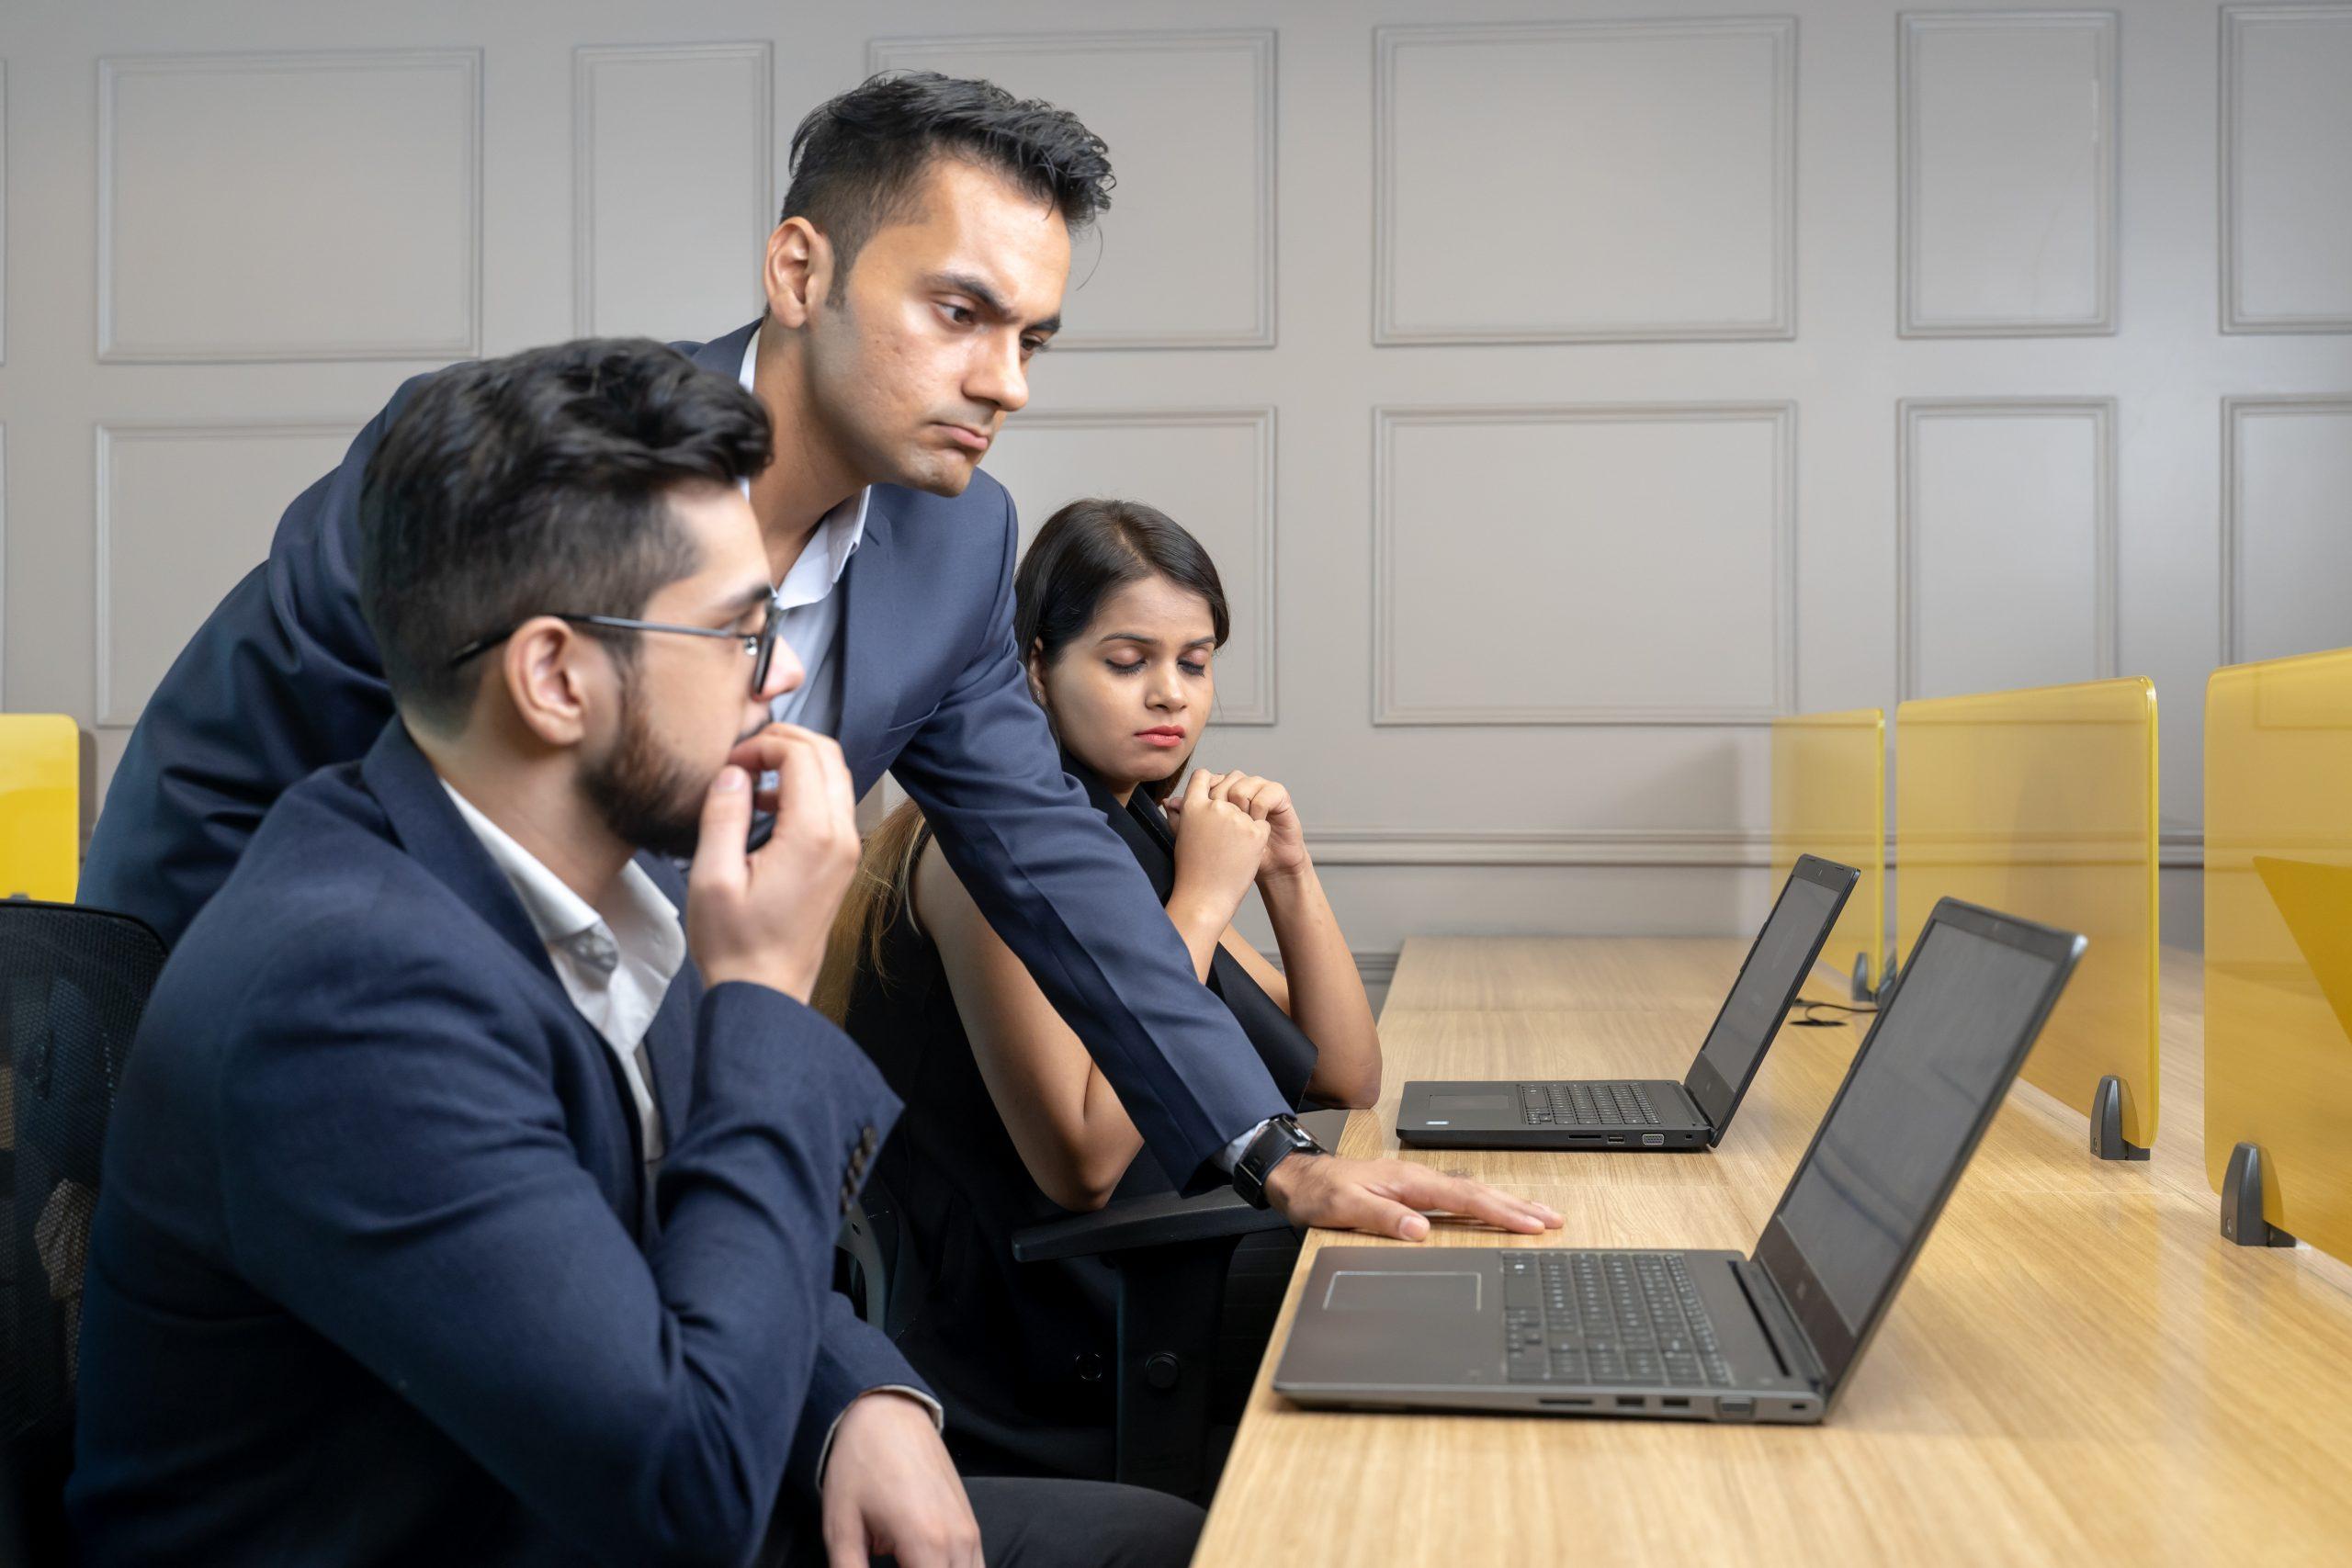 Employee scared of boss